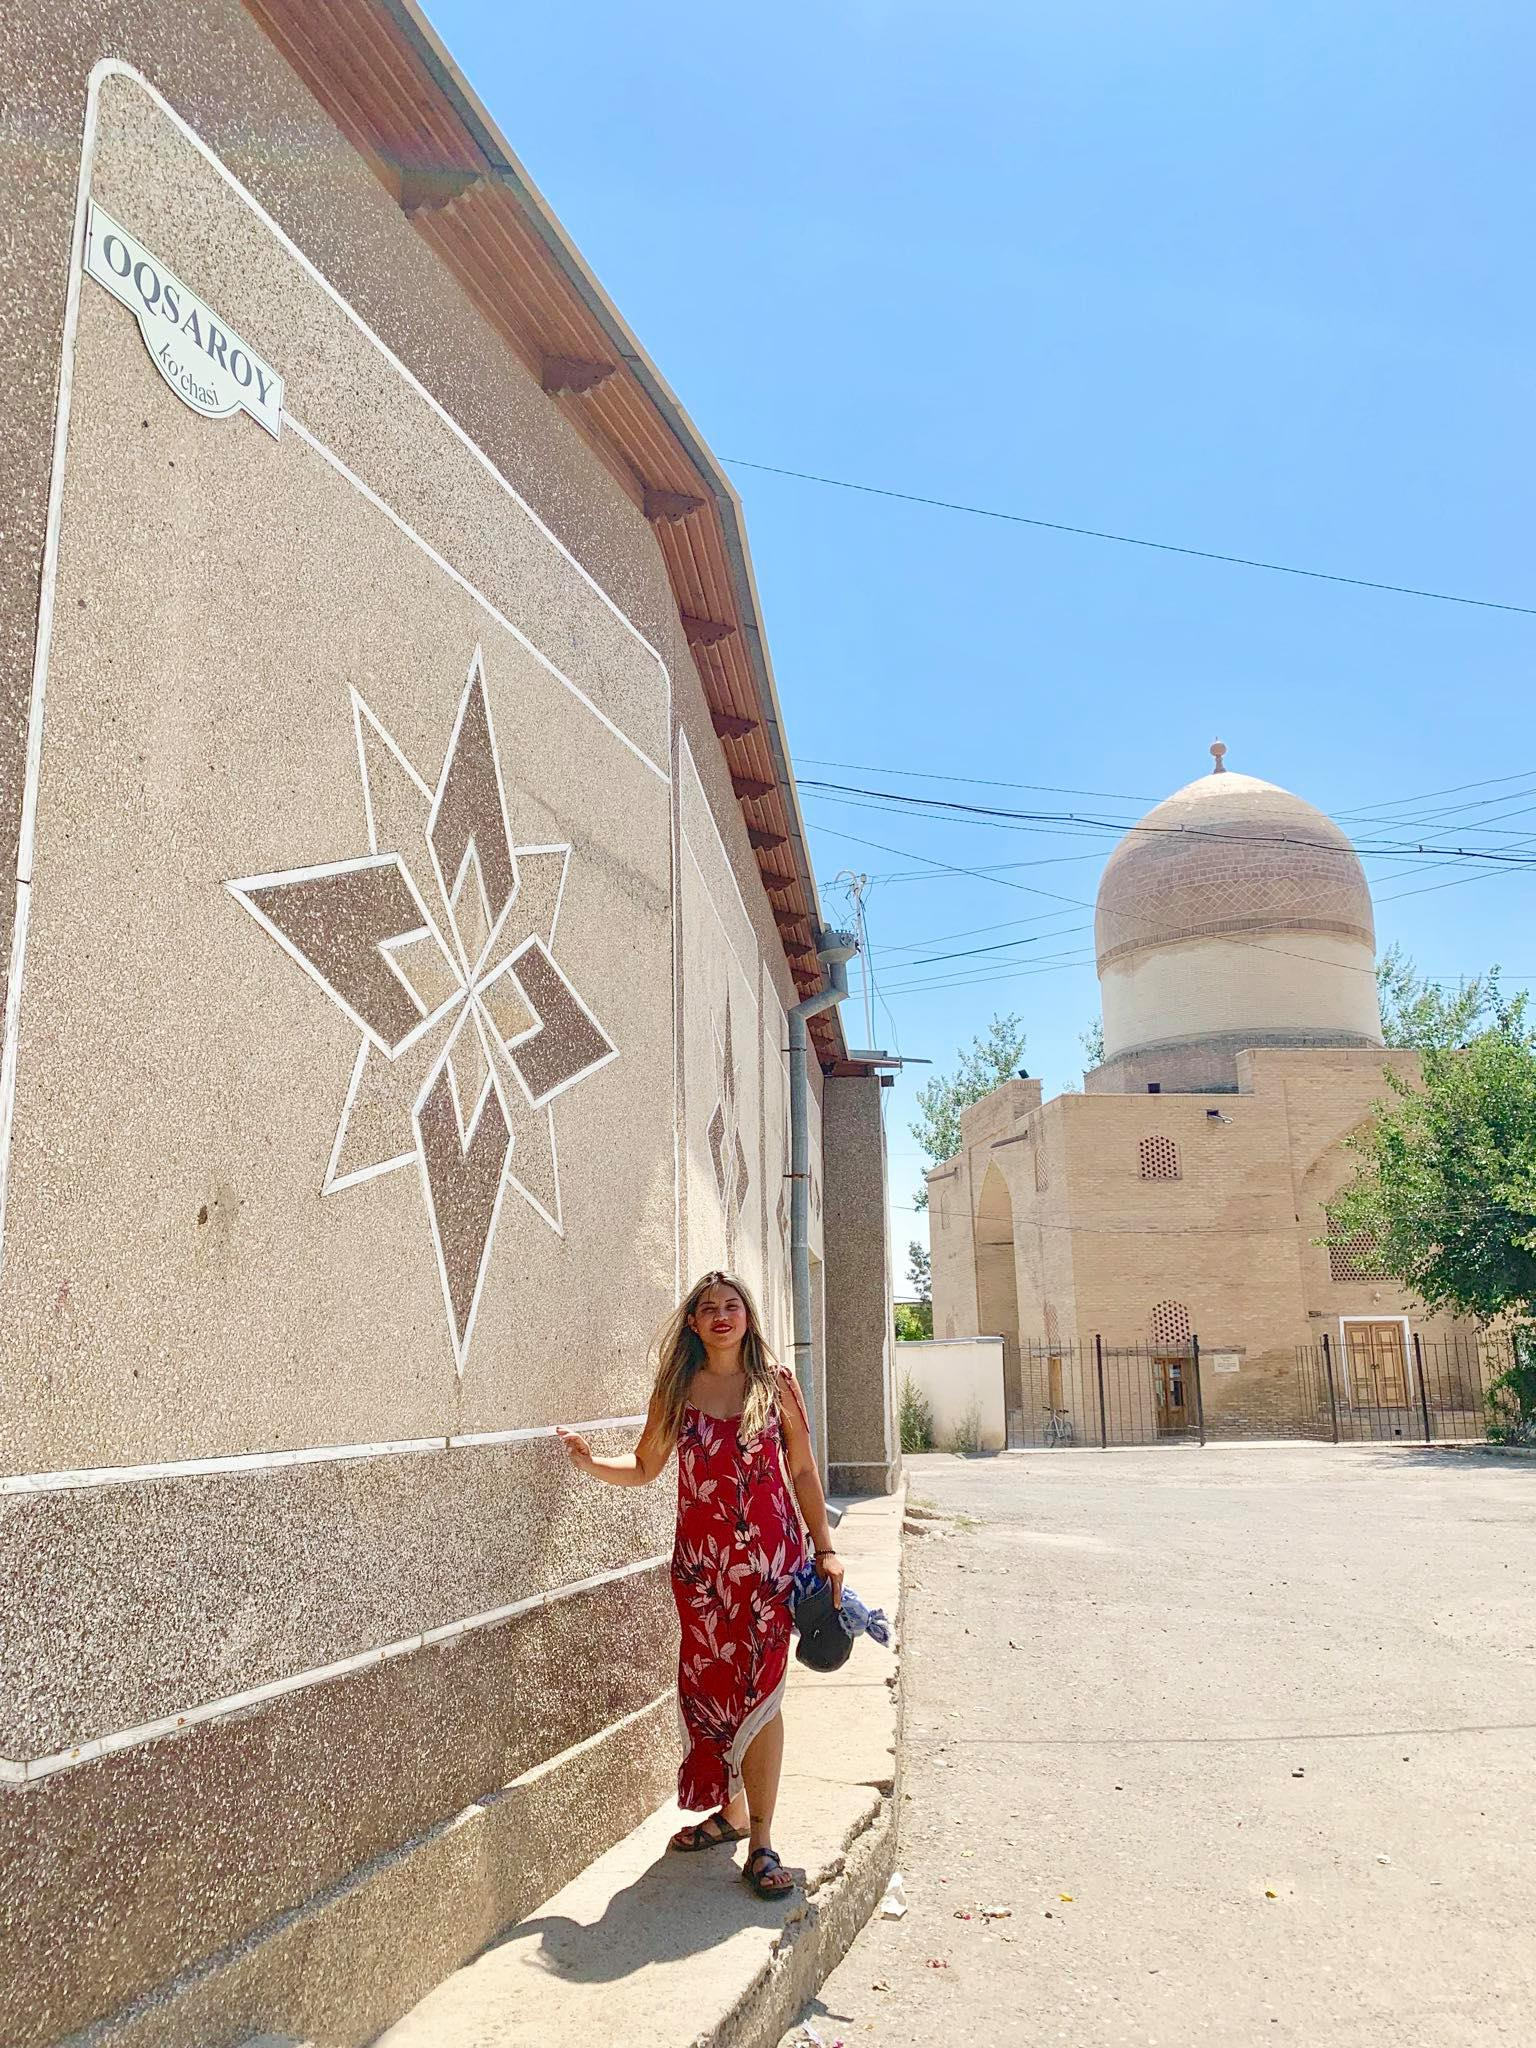 Kach Solo Travels in 2019 Siyab Bazaar and Registan on my first day in Samarkand10.jpg